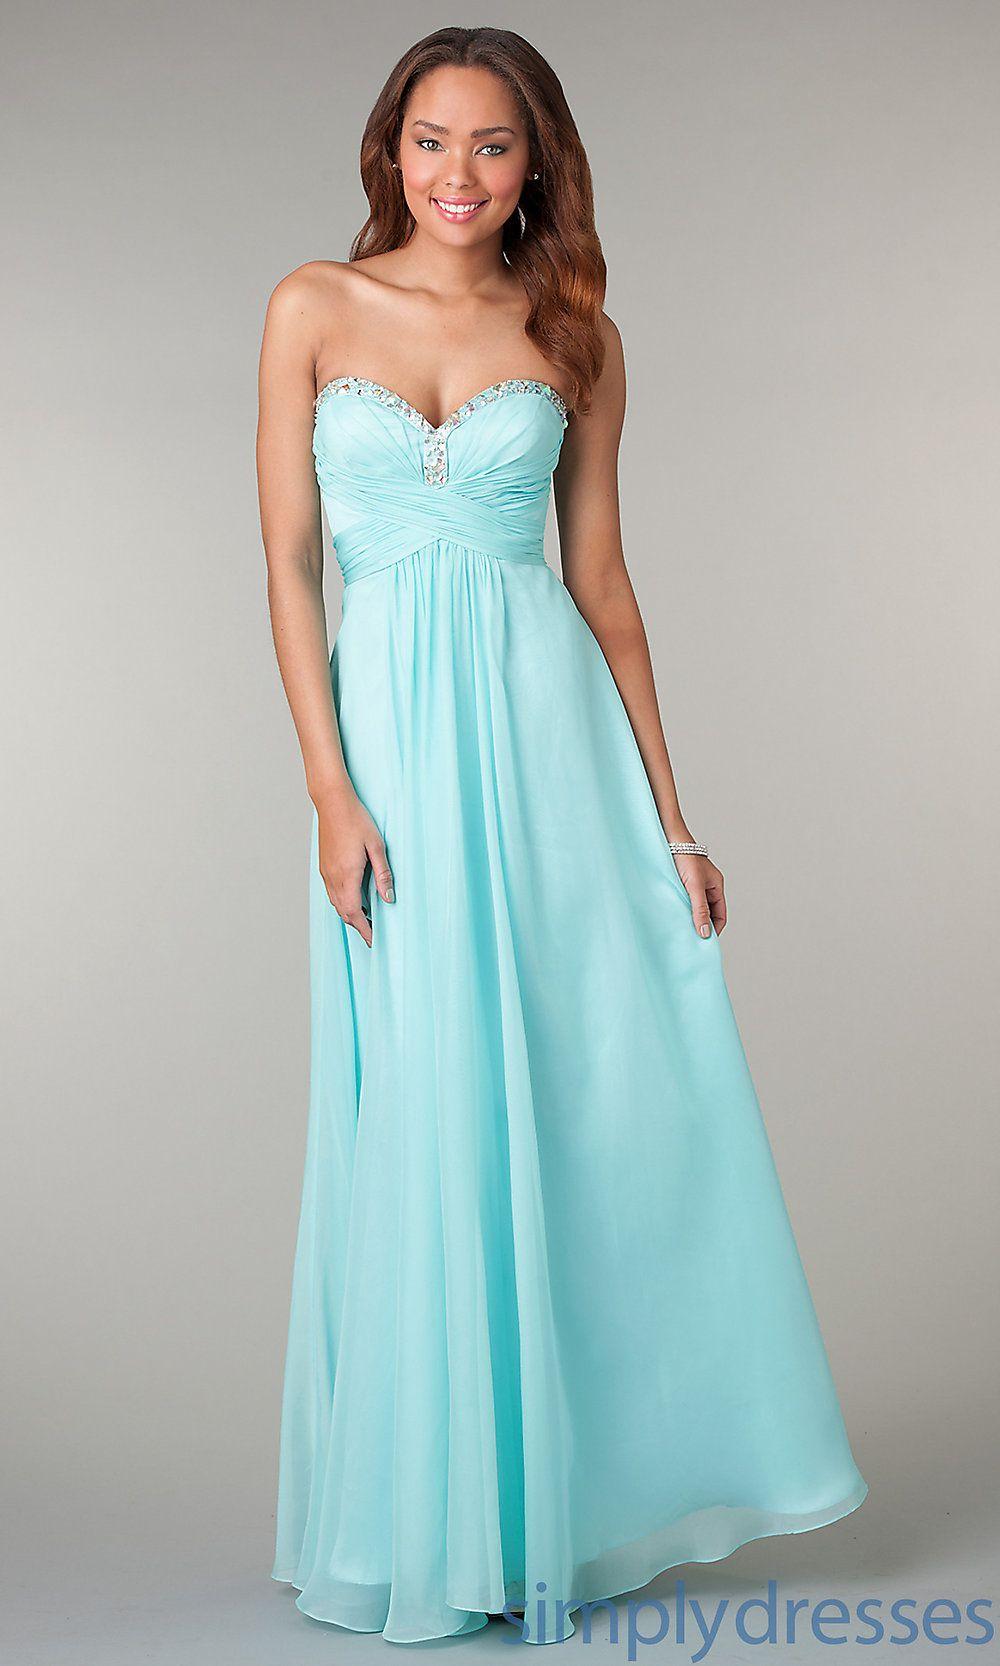 Long Mint Strapless Prom Dress Bridesmaid Dresses Strapless Prom Dresses Long Mint Prom Dress [ 1666 x 1000 Pixel ]